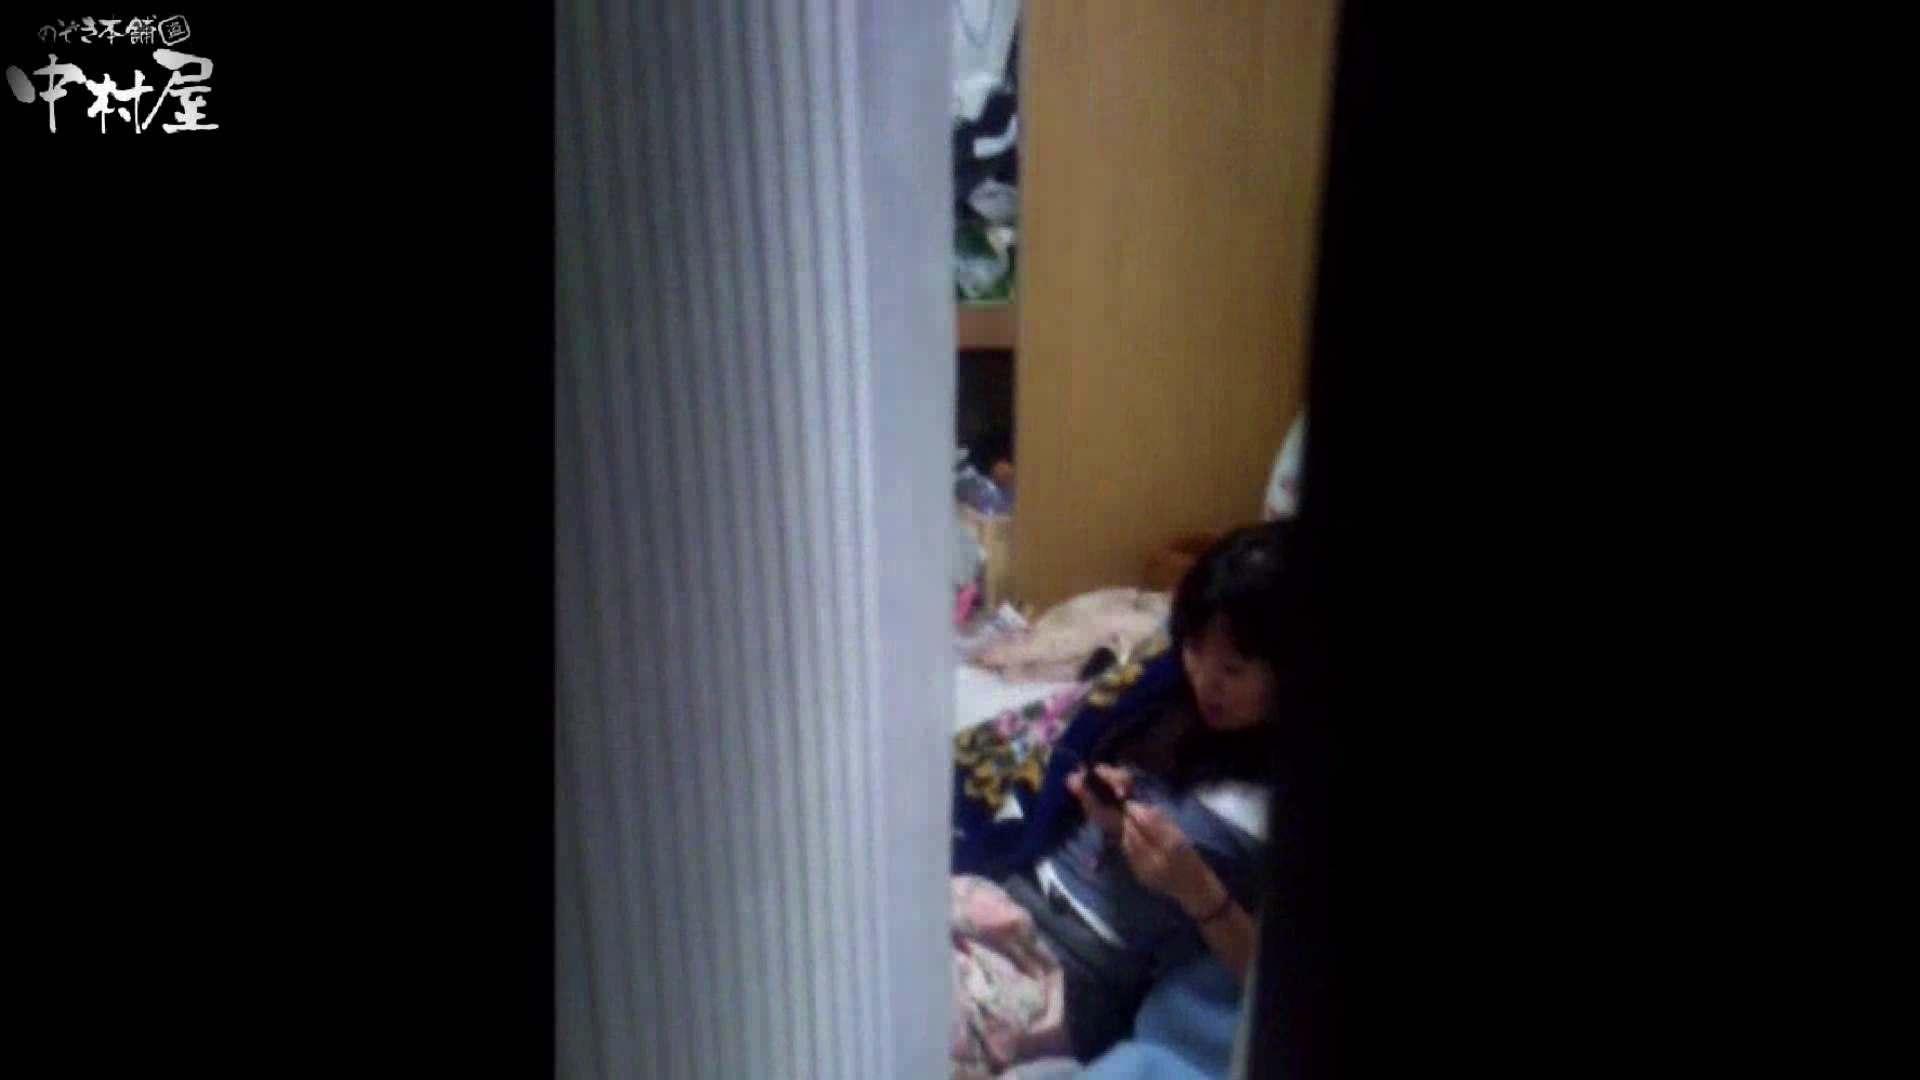 民家風呂専門盗撮師の超危険映像 vol.012 美少女のエロ生活  73連発 72